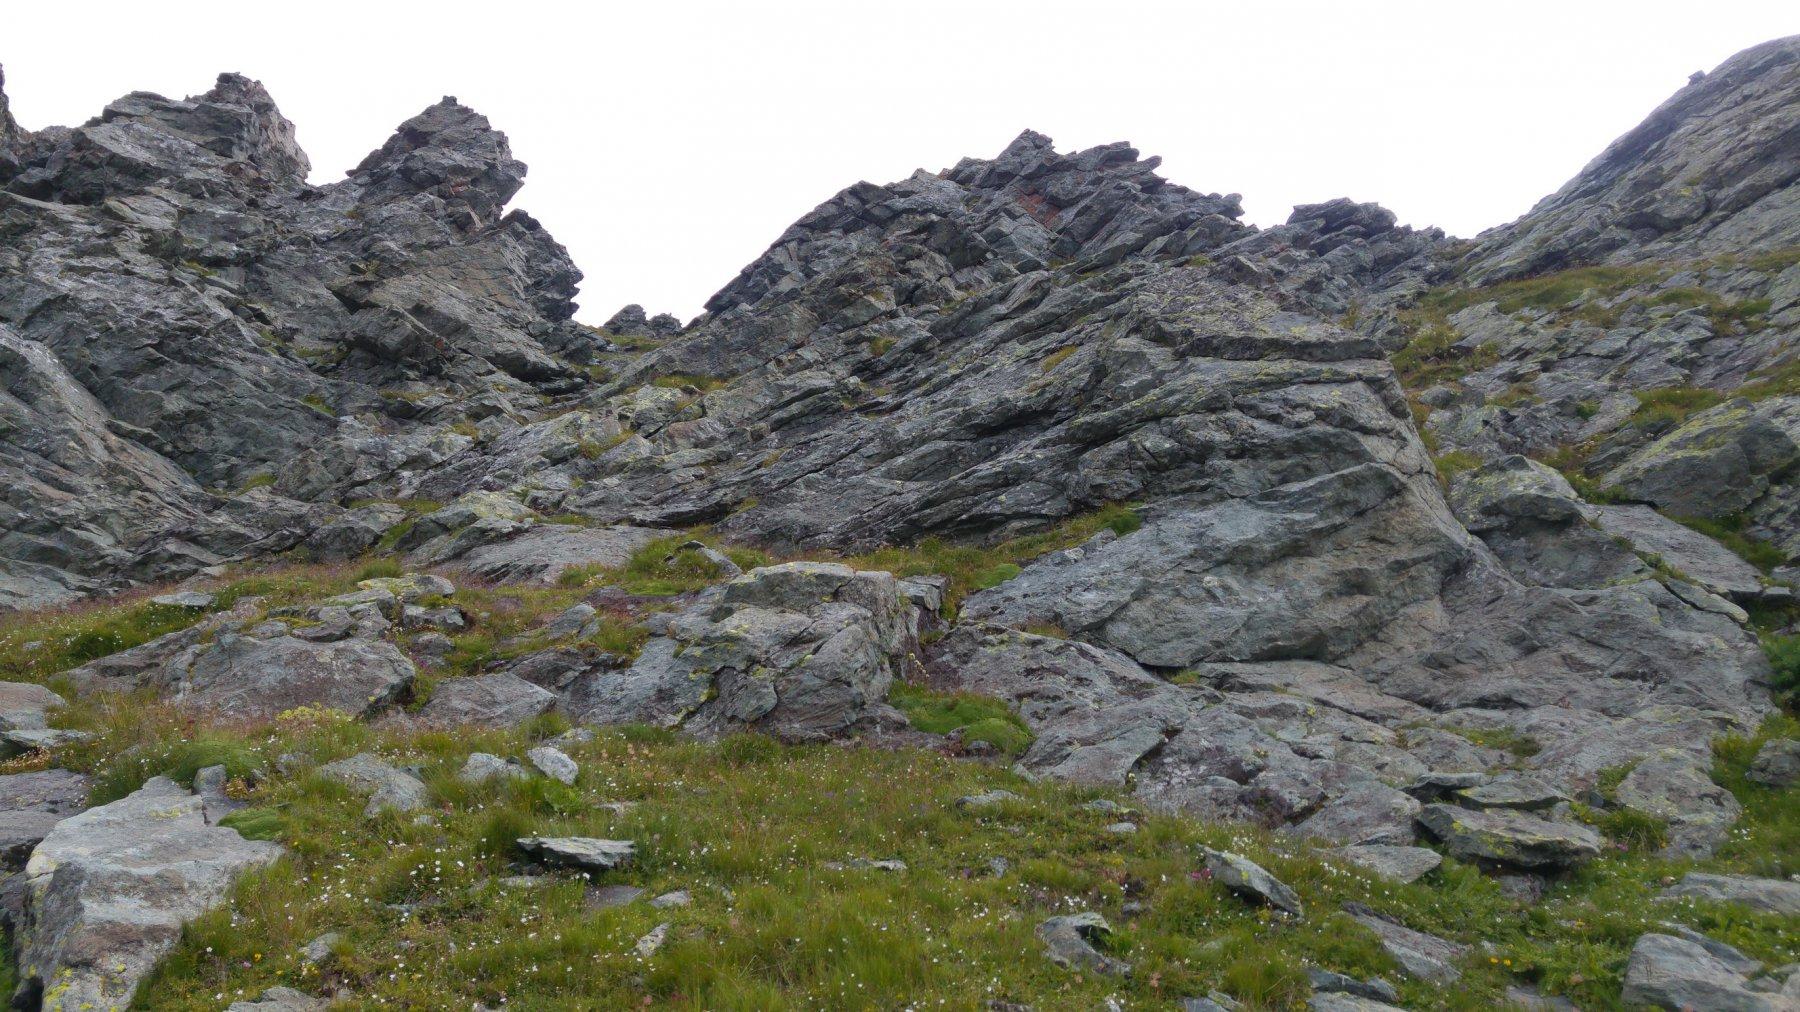 Autour (Cima) e Punta Lucellina Traversata di Cresta dal Passo Casset 2016-08-18